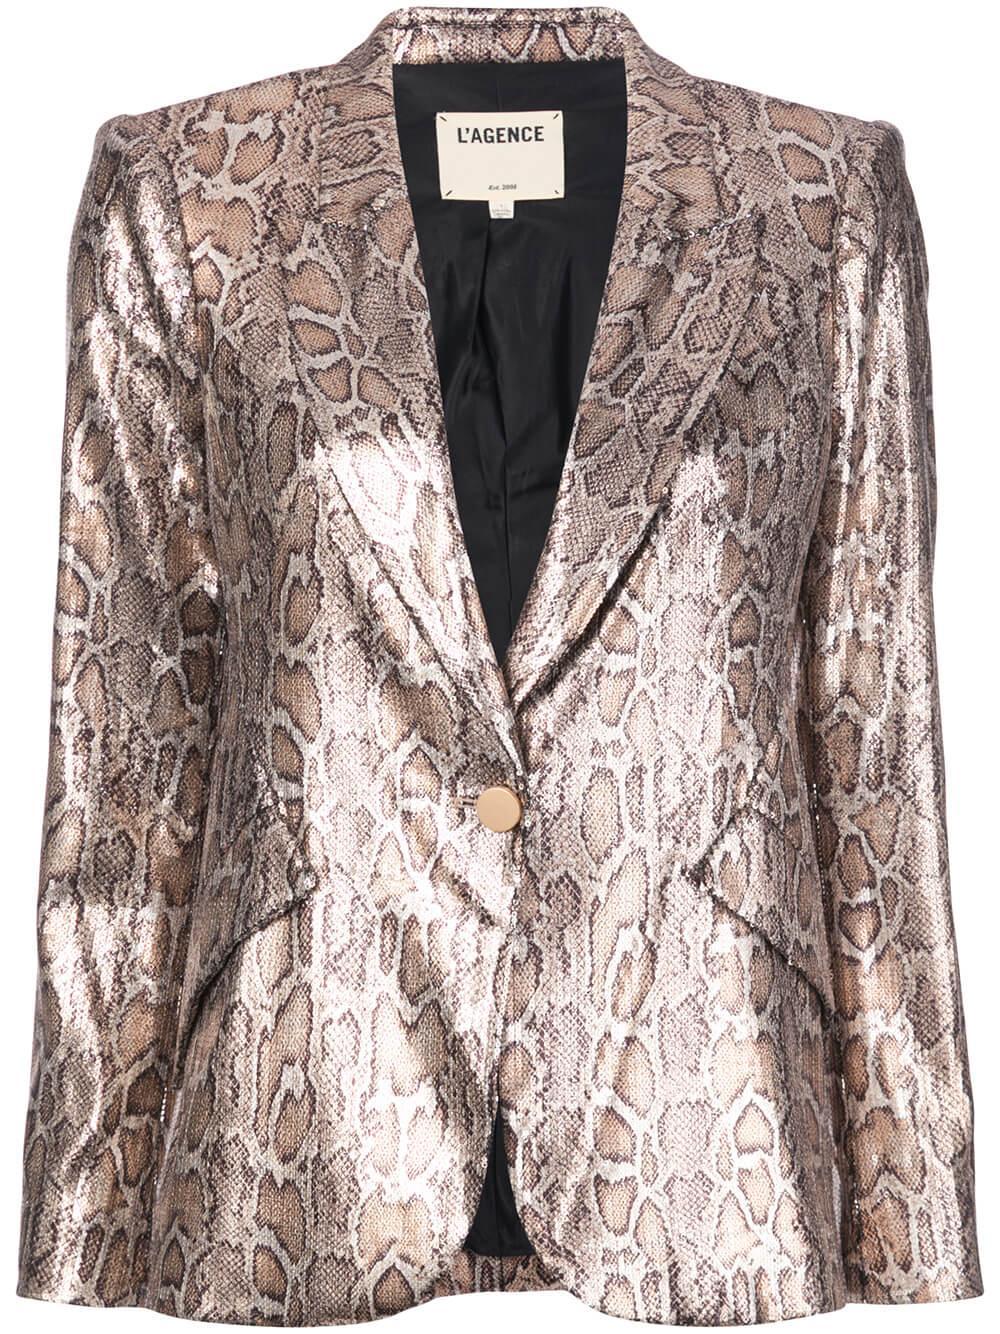 Chamberlain Sequin Python Blazer Item # 1377SNS